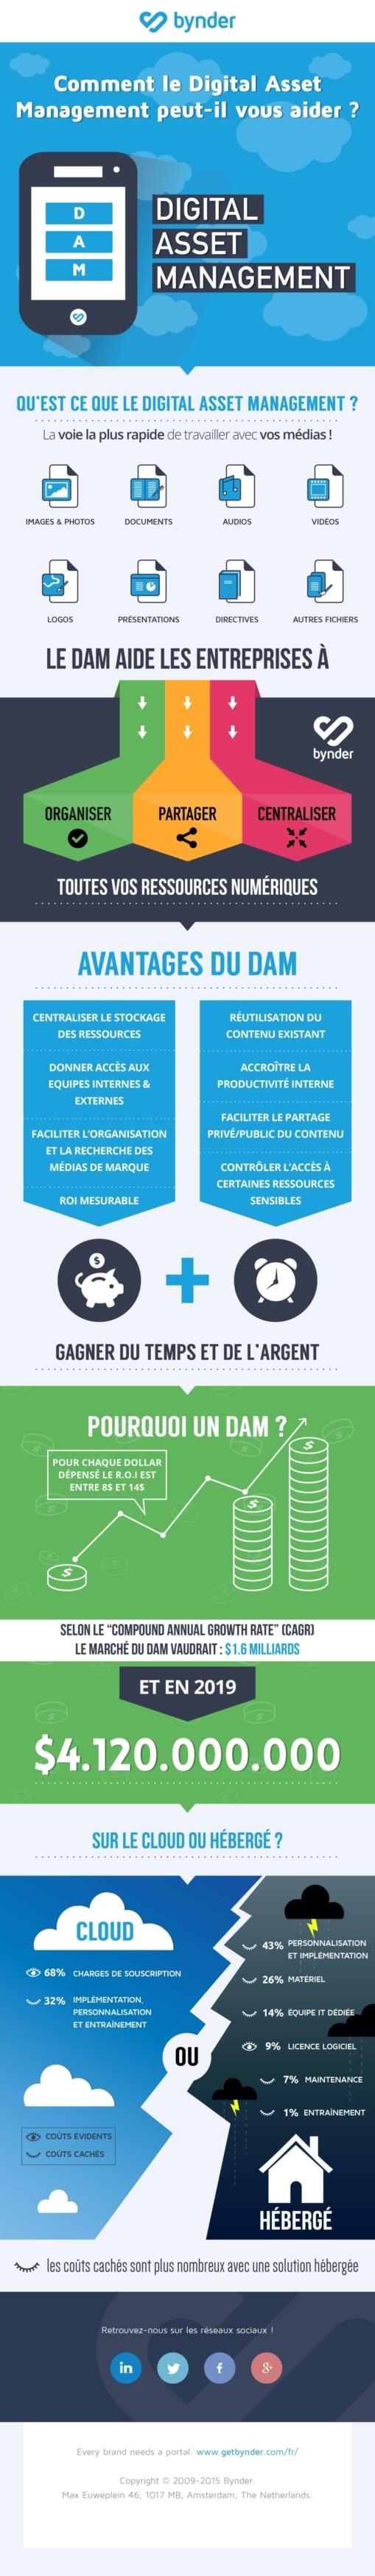 DAM FR Infographic HQ 04